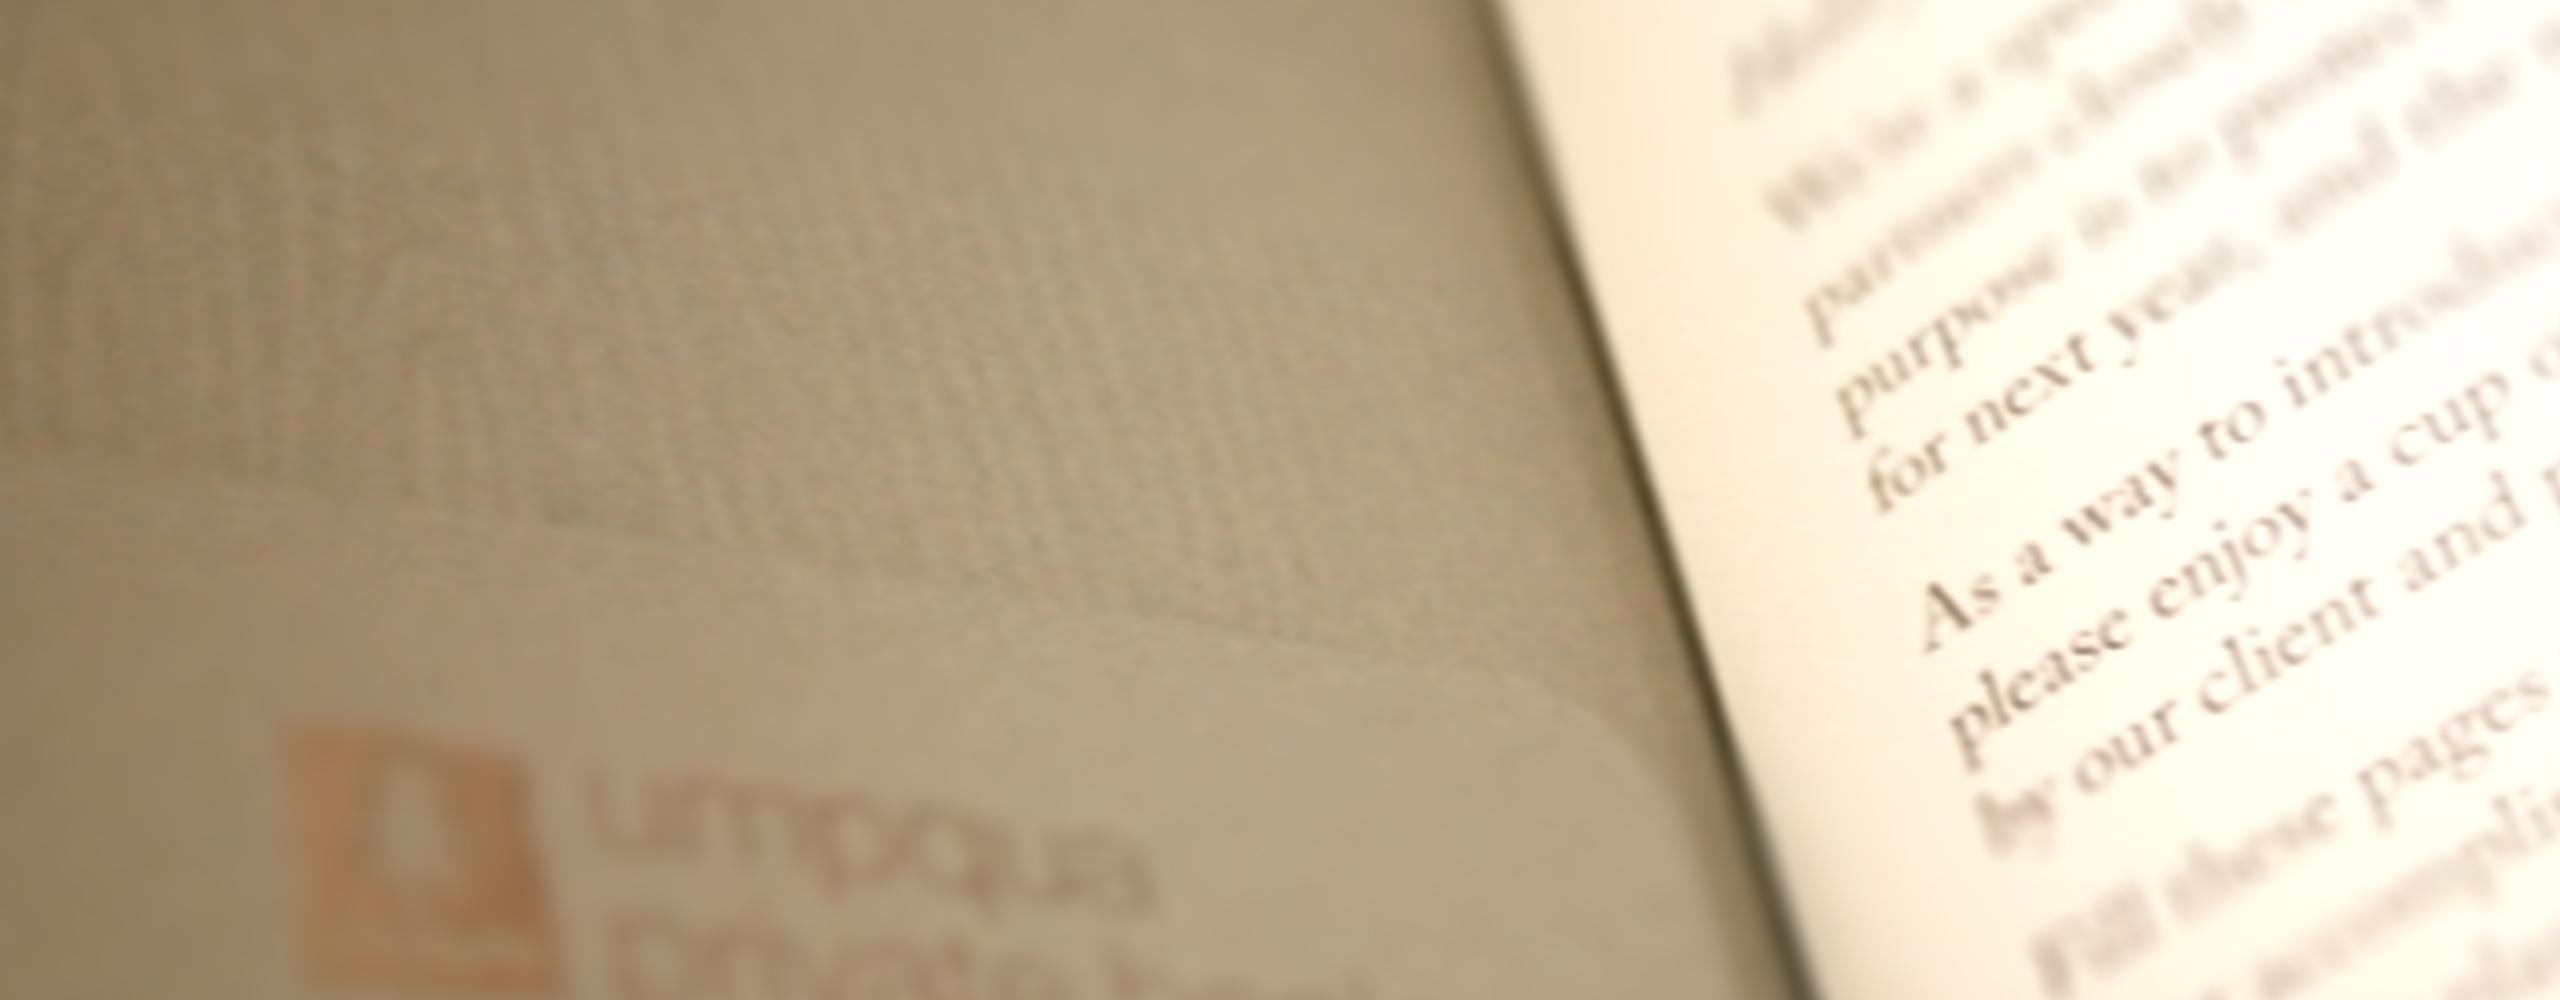 Banner for Umpqua Bank Customer Mini-Journal